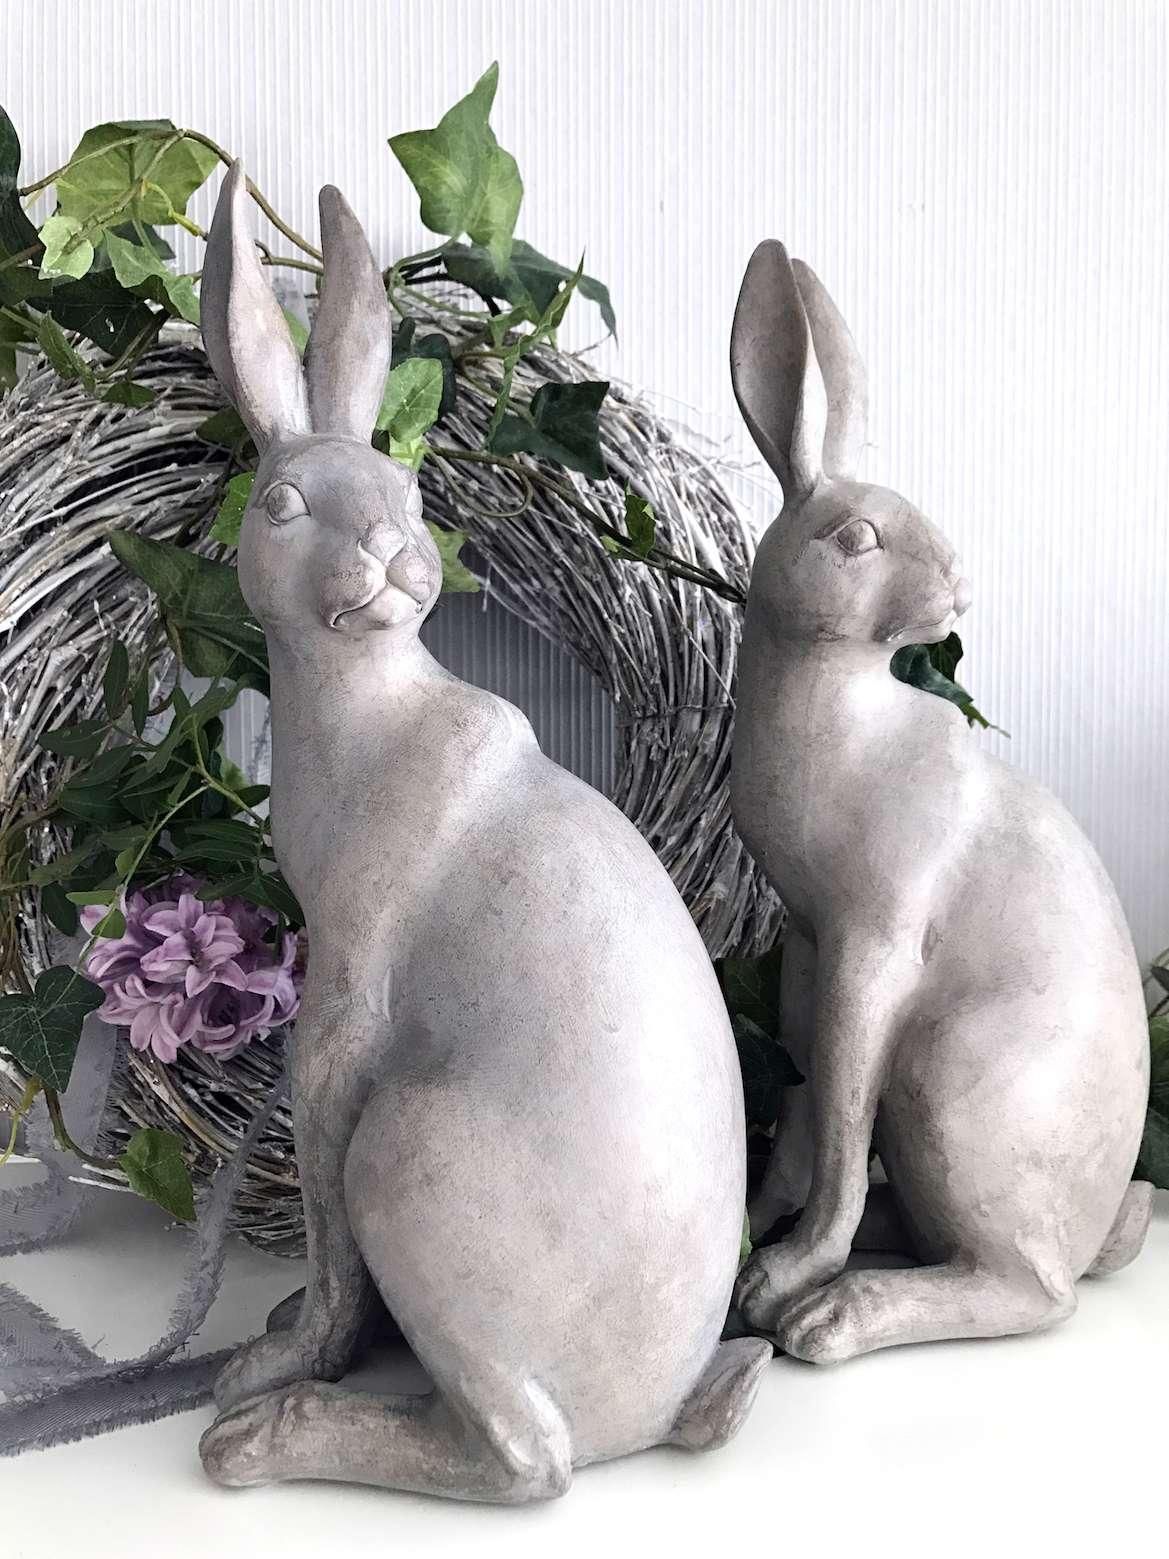 Hase Osterhase Grau Weiß Ostern Shabby Chic 31cm Osterdeko Rabbit